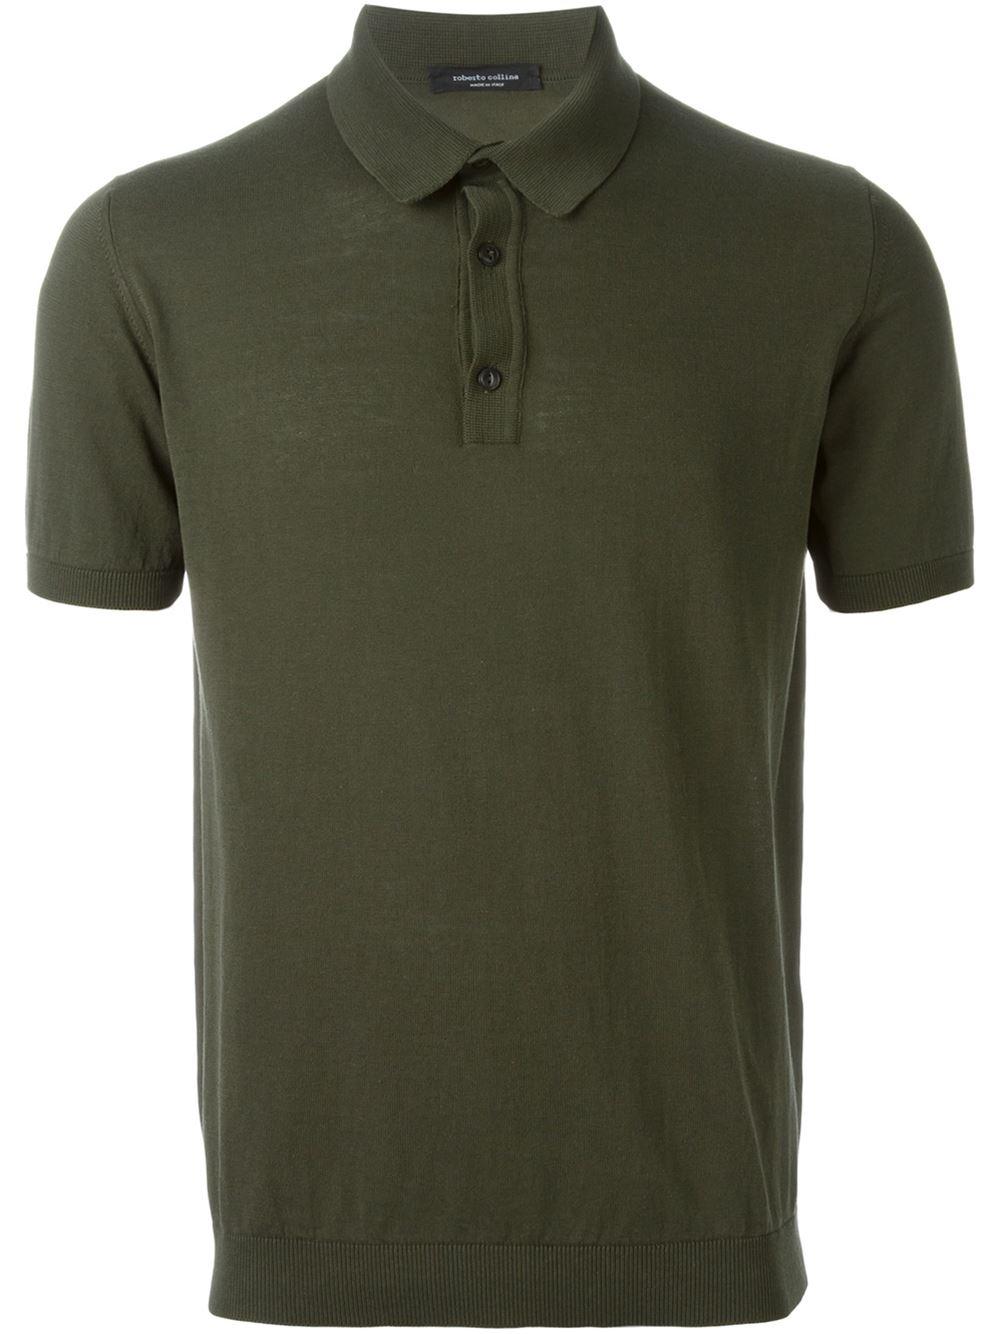 Roberto Collina Green Knit Polo Shirt